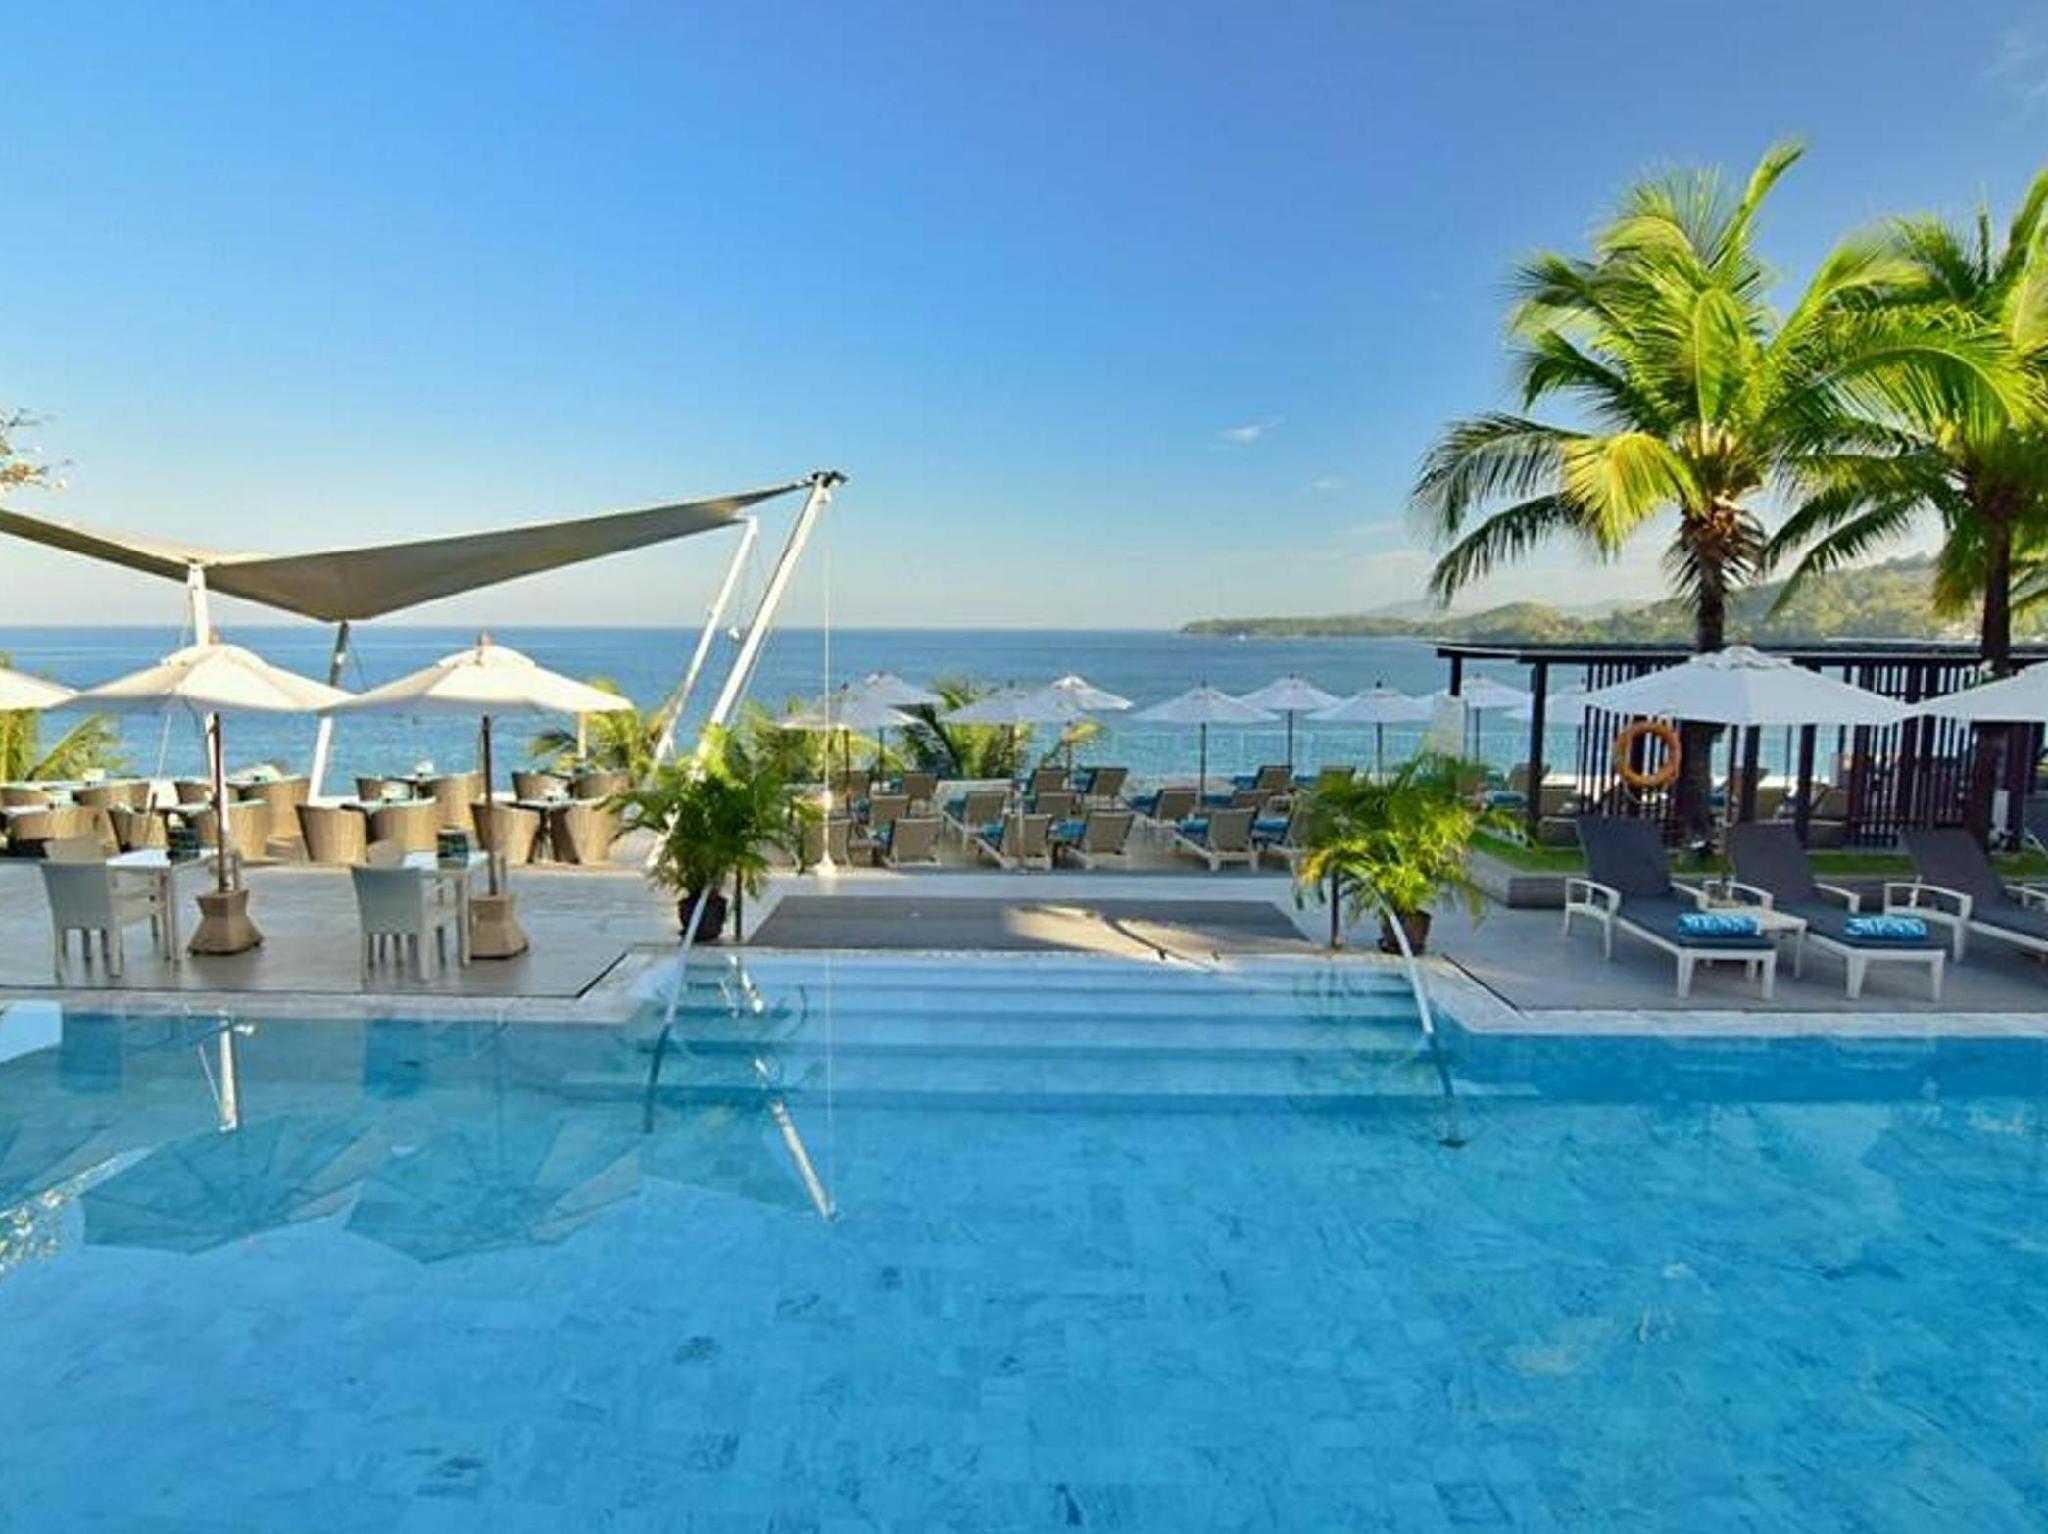 Cape Sienna Phuket Hotel and Villas26